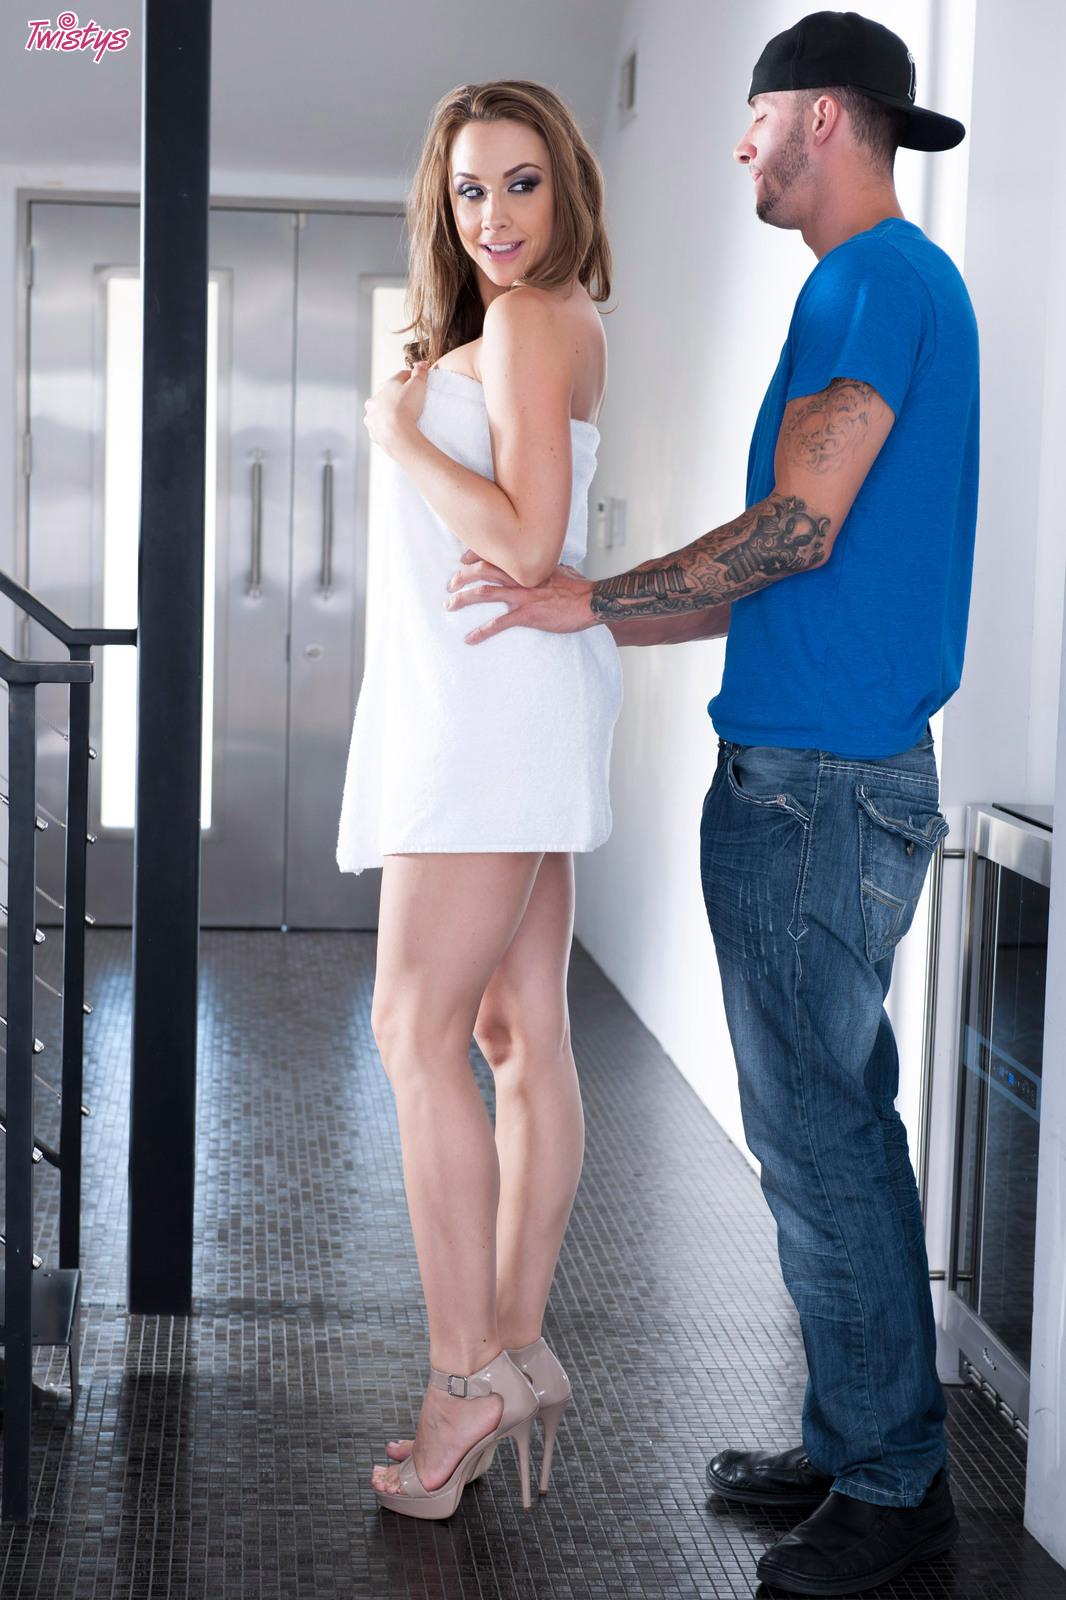 Gettin' Kinky In The Shower.. featuring Chanel Preston   Twistys.com